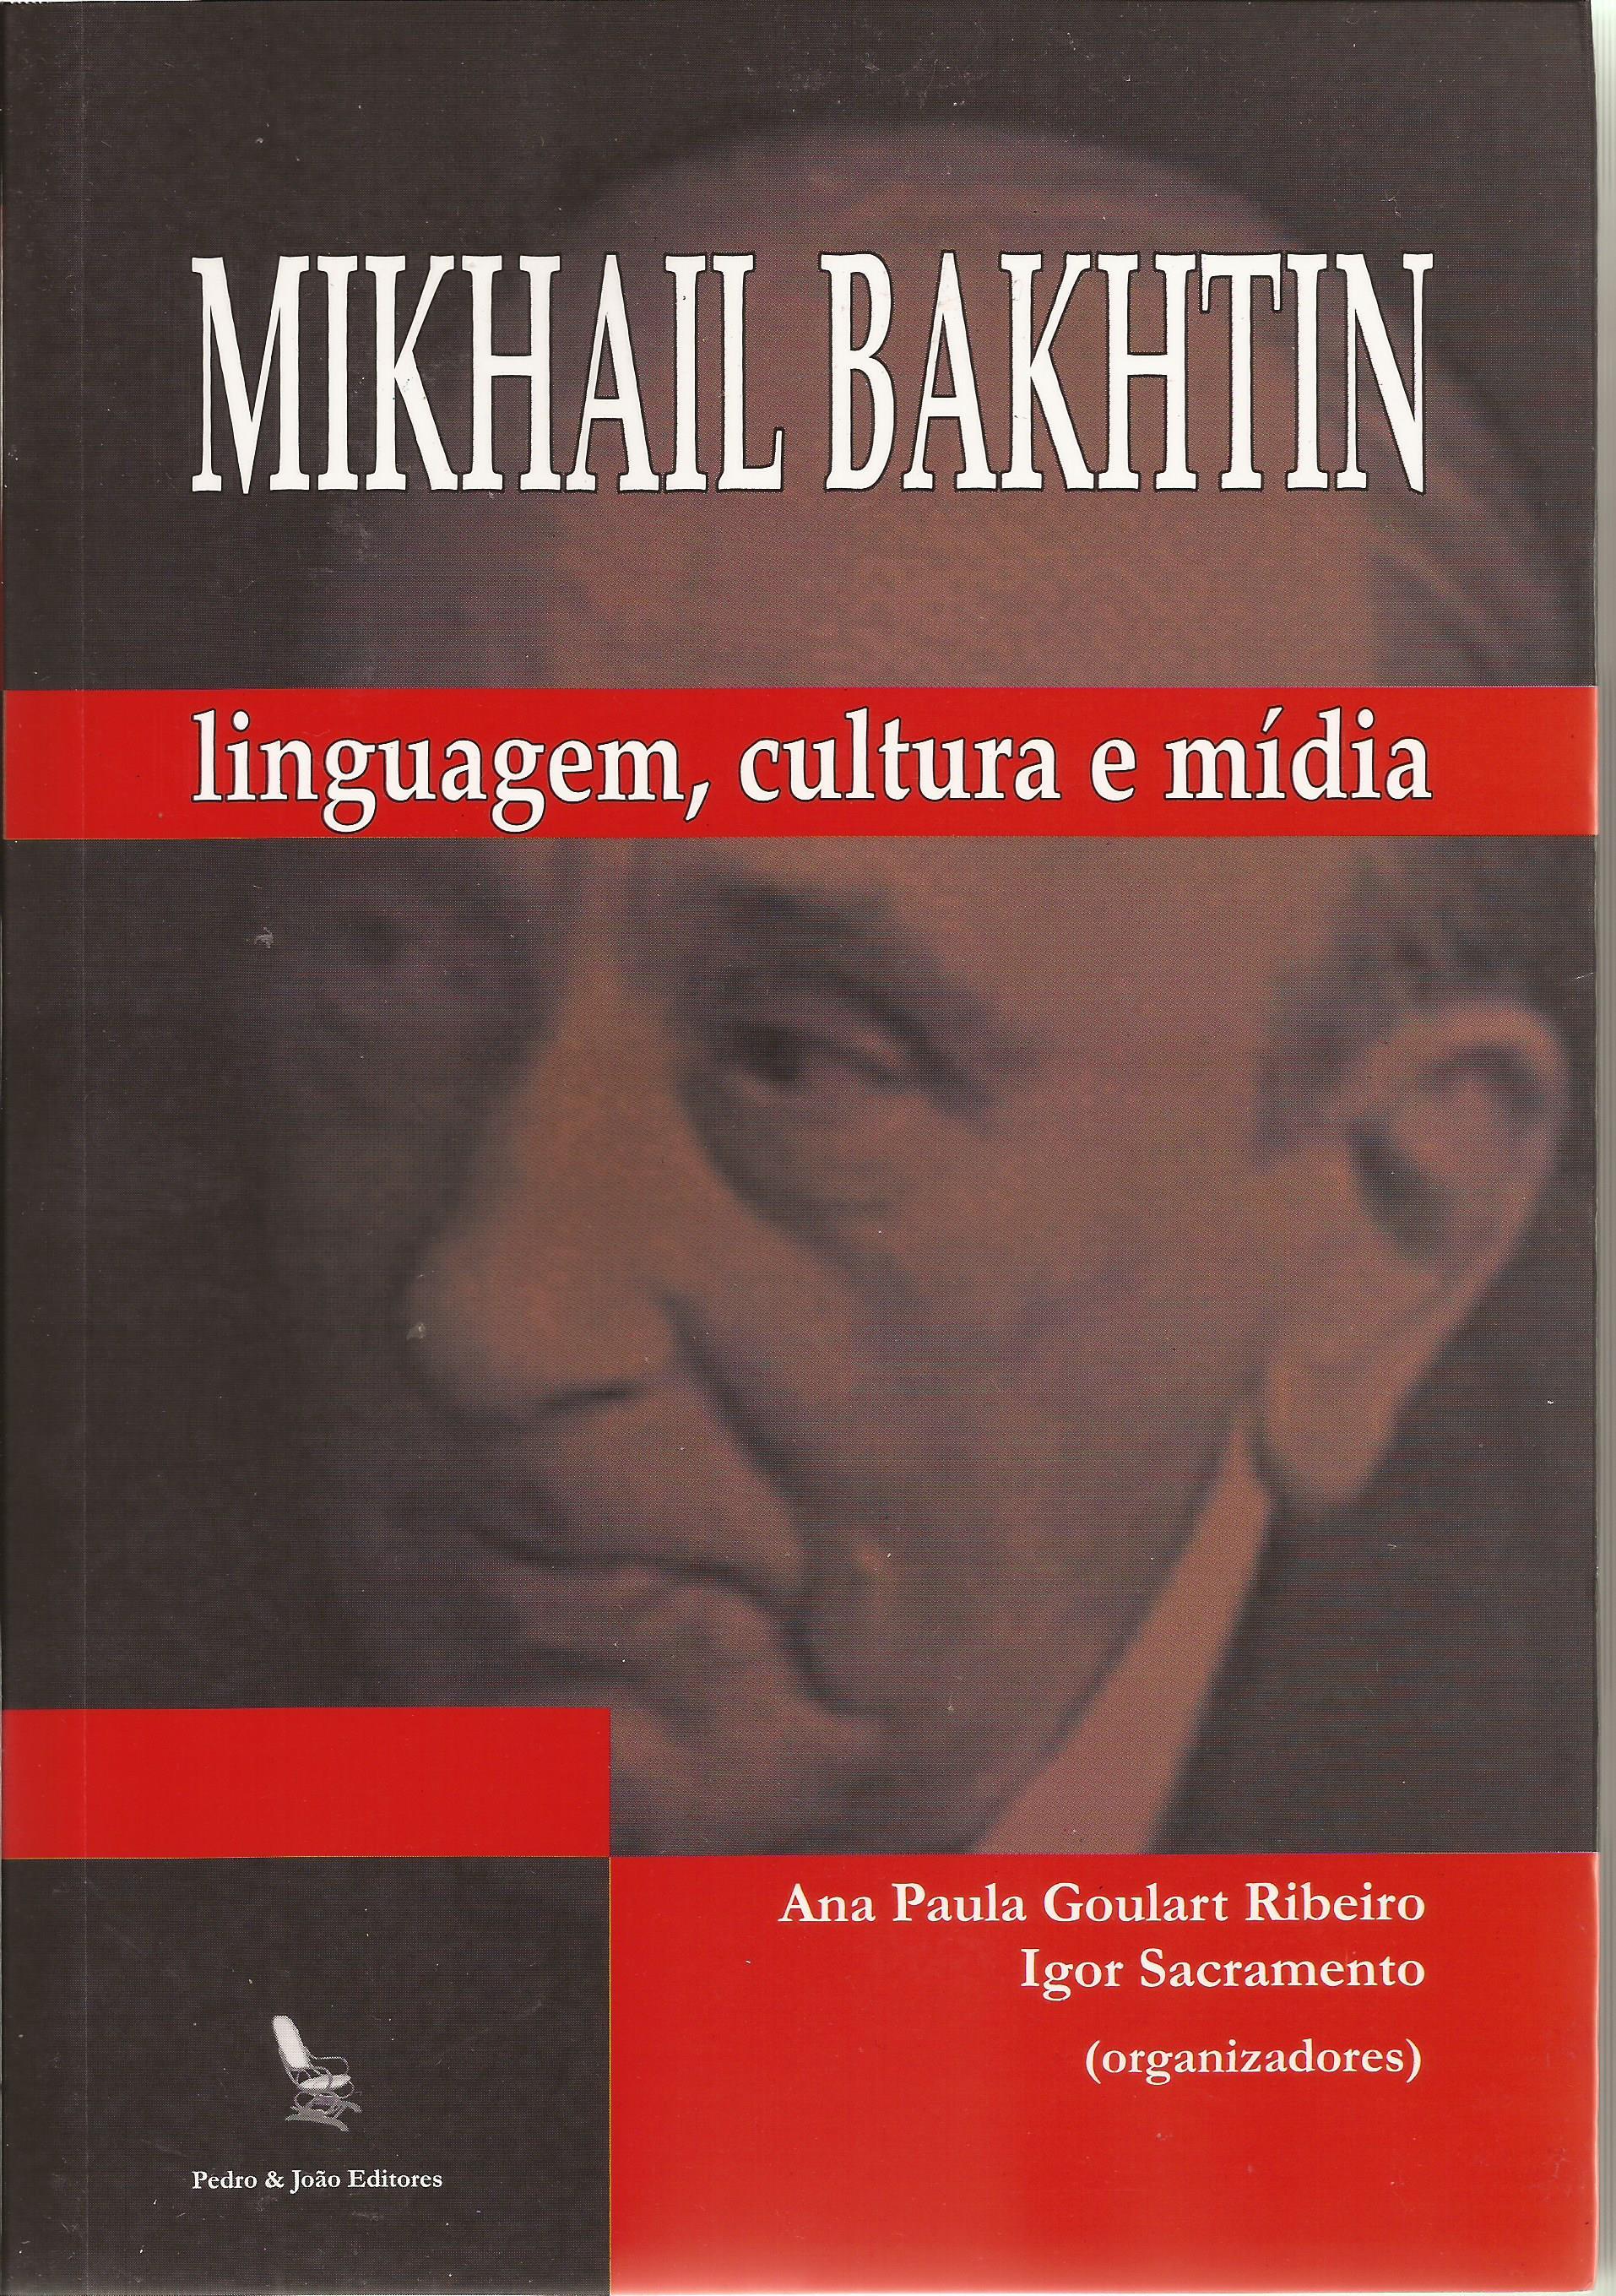 Mikhail Bakhtin – linguagem, cultura e mídia